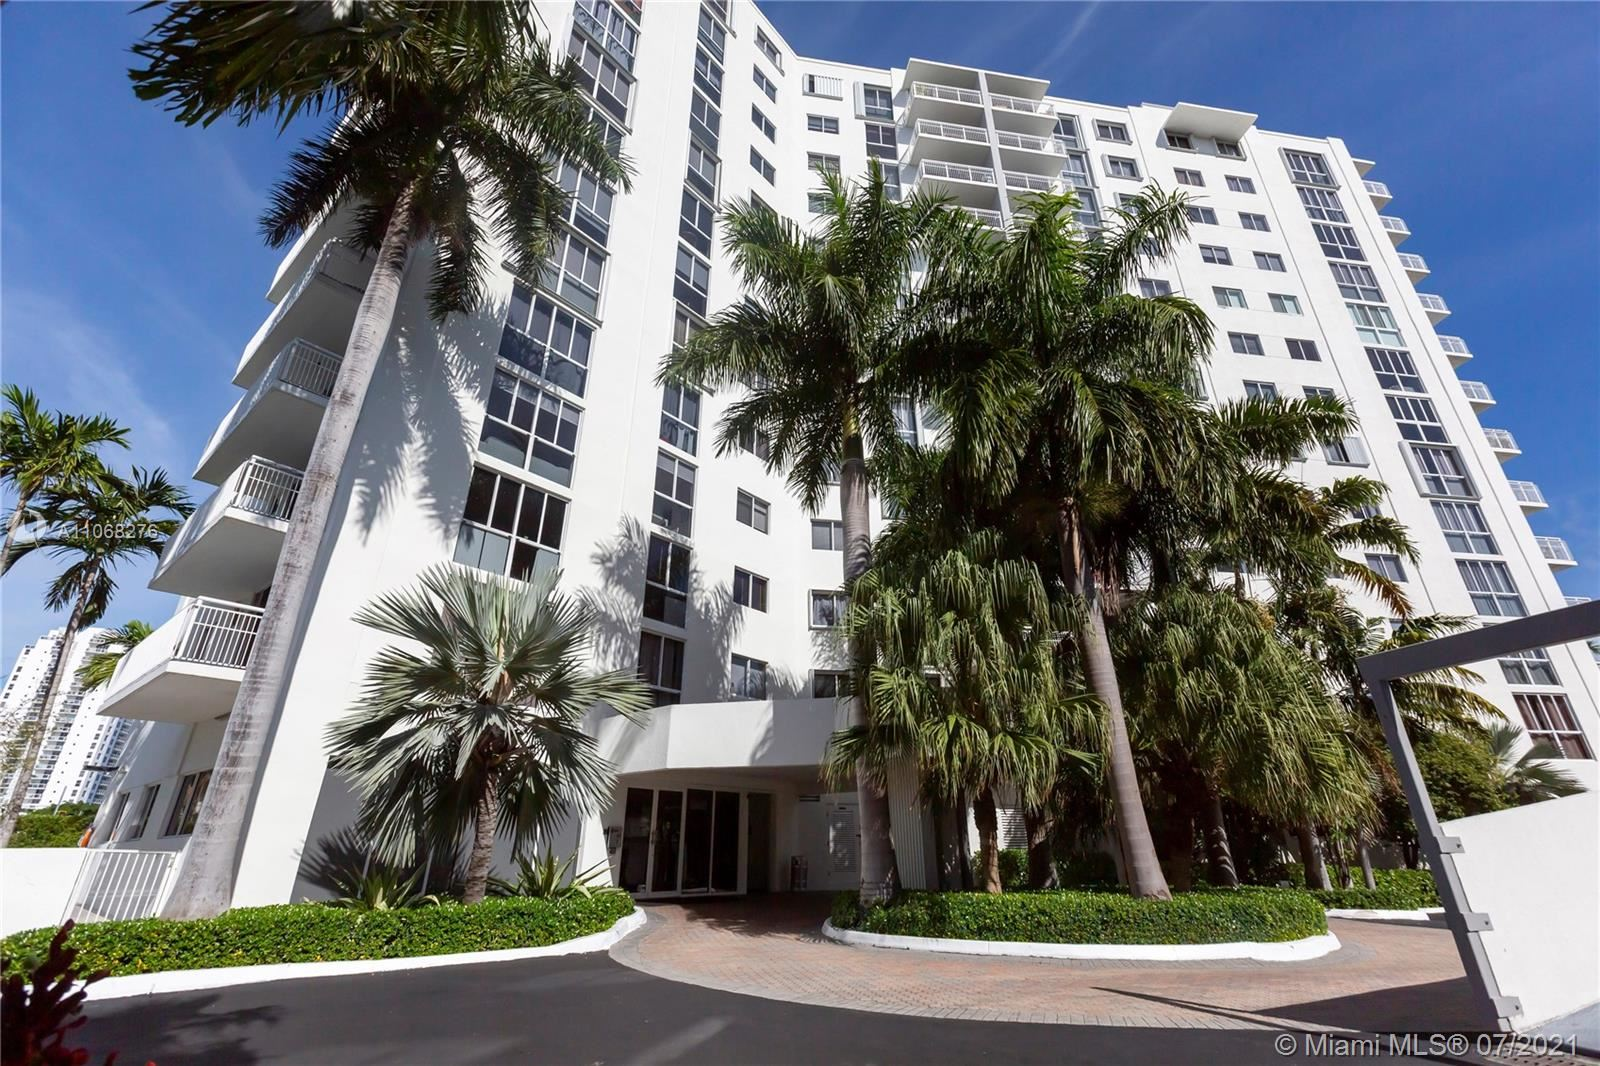 1688 West Avenue #G-06, Miami Beach, FL 33139 - #: A11068276